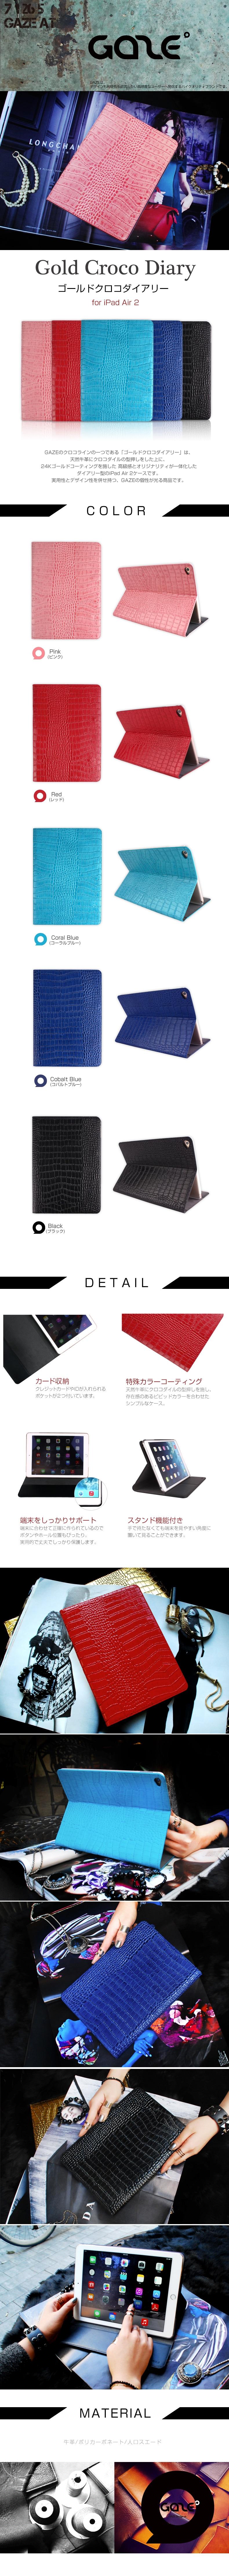 商品詳細-iPadAir2専用ケース